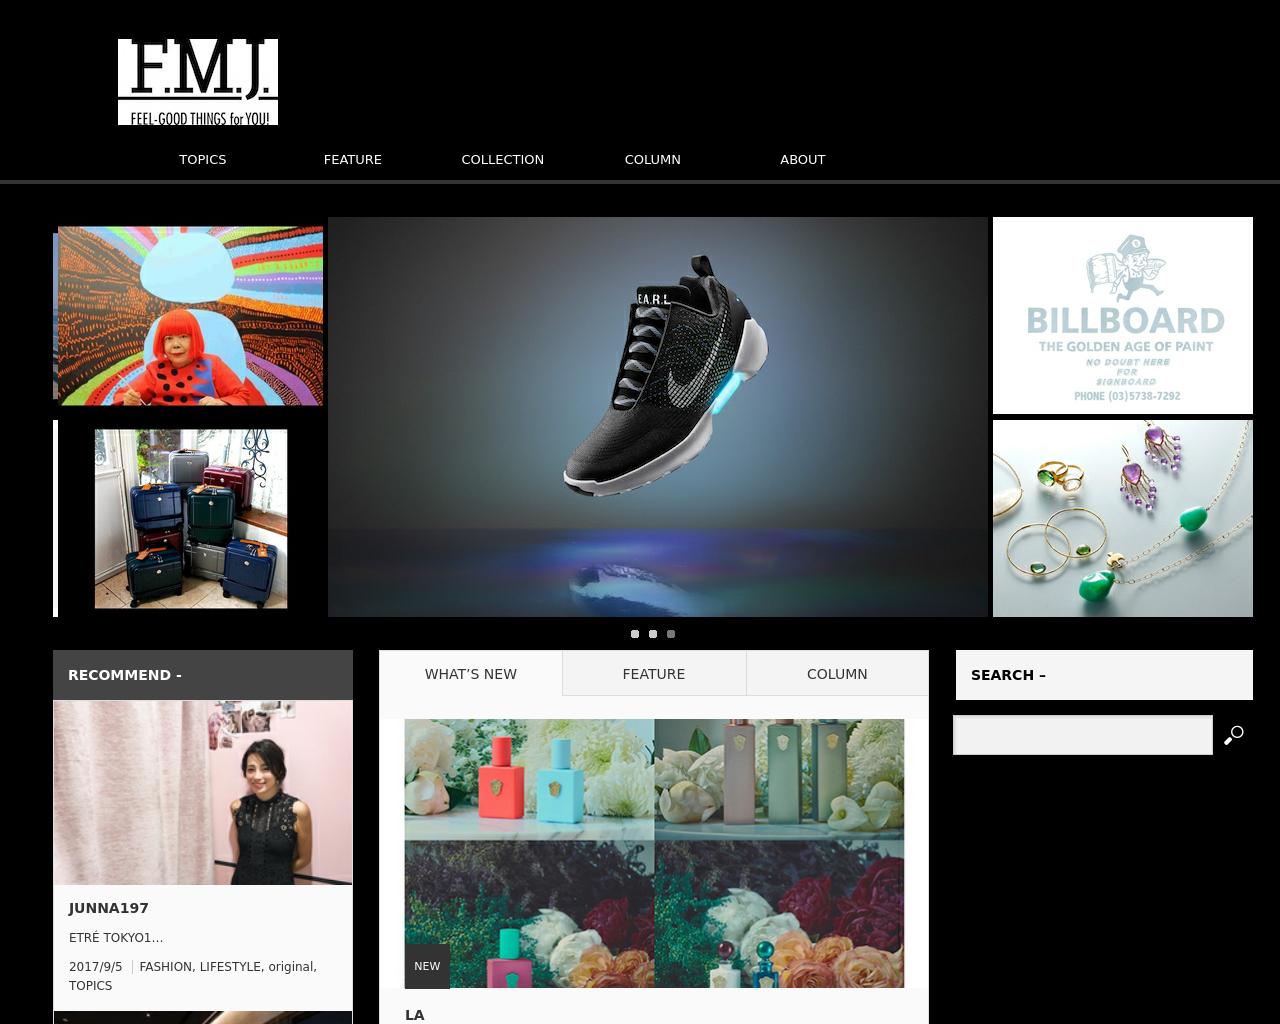 F.M.J.-Advertising-Reviews-Pricing